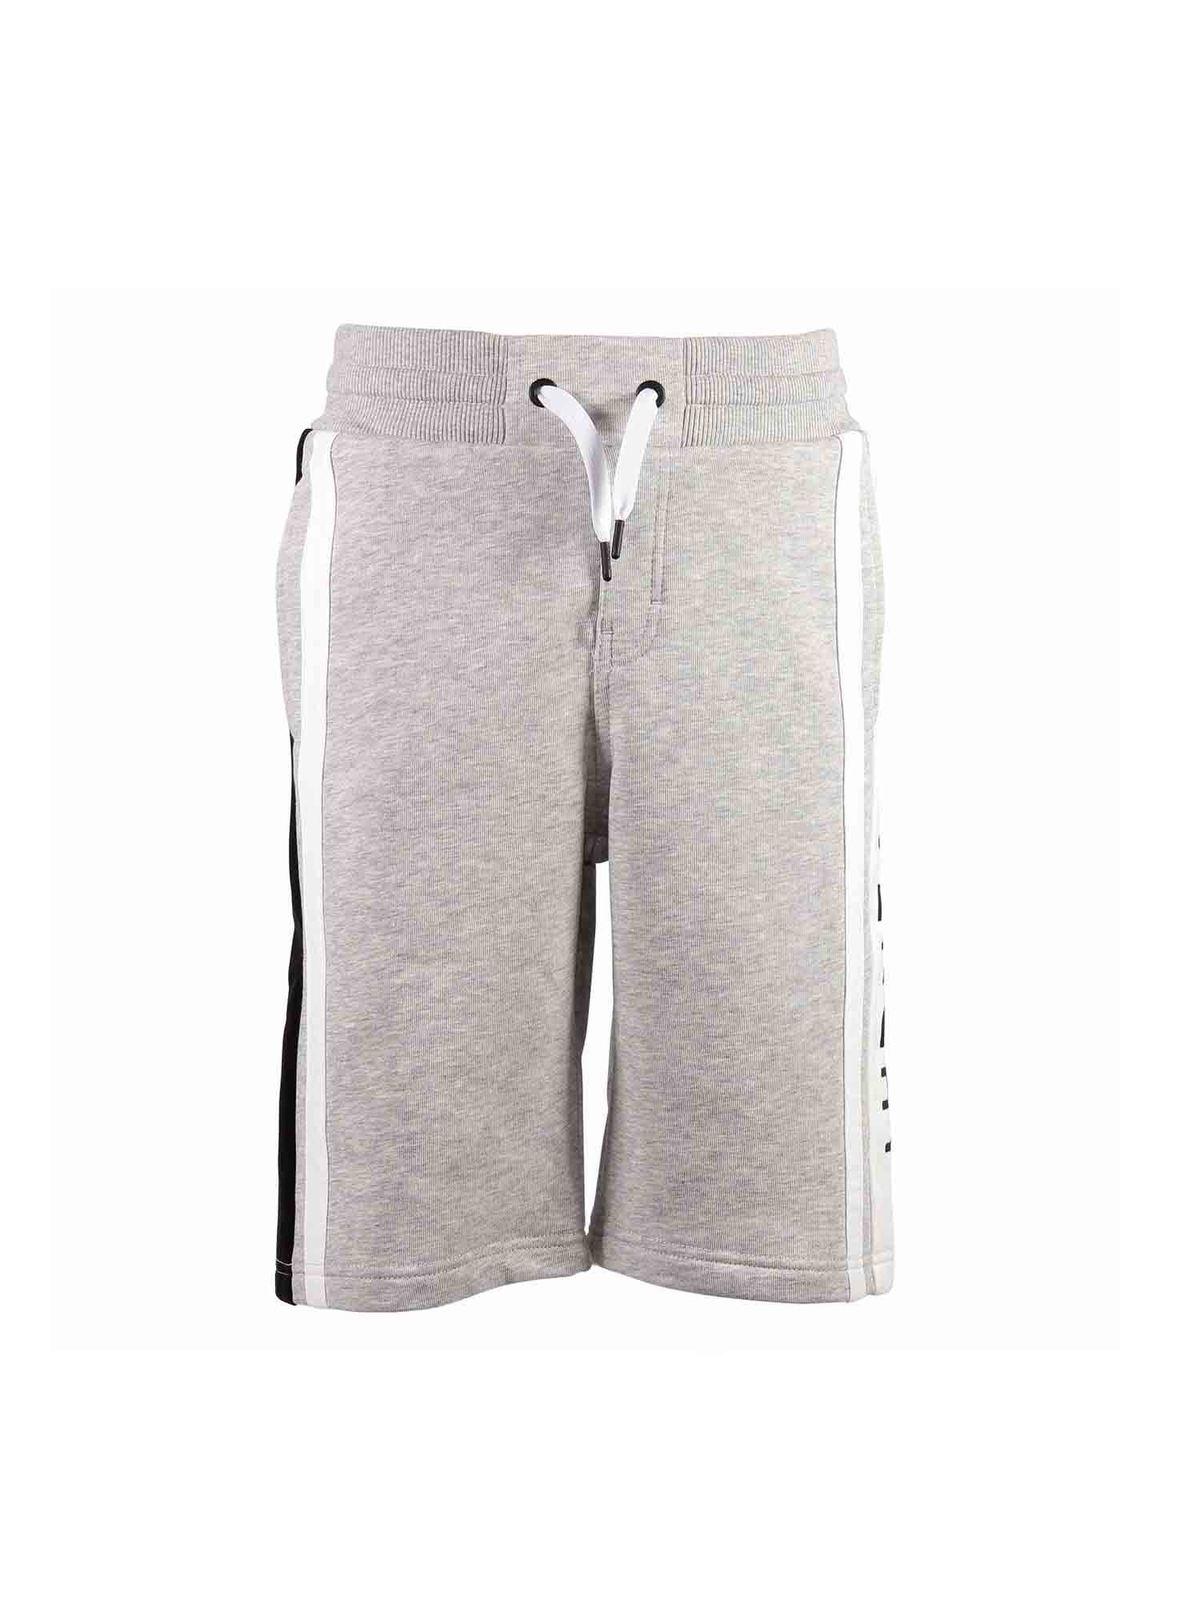 Givenchy Kids' Branded Shorts In Grey Melange Cotton